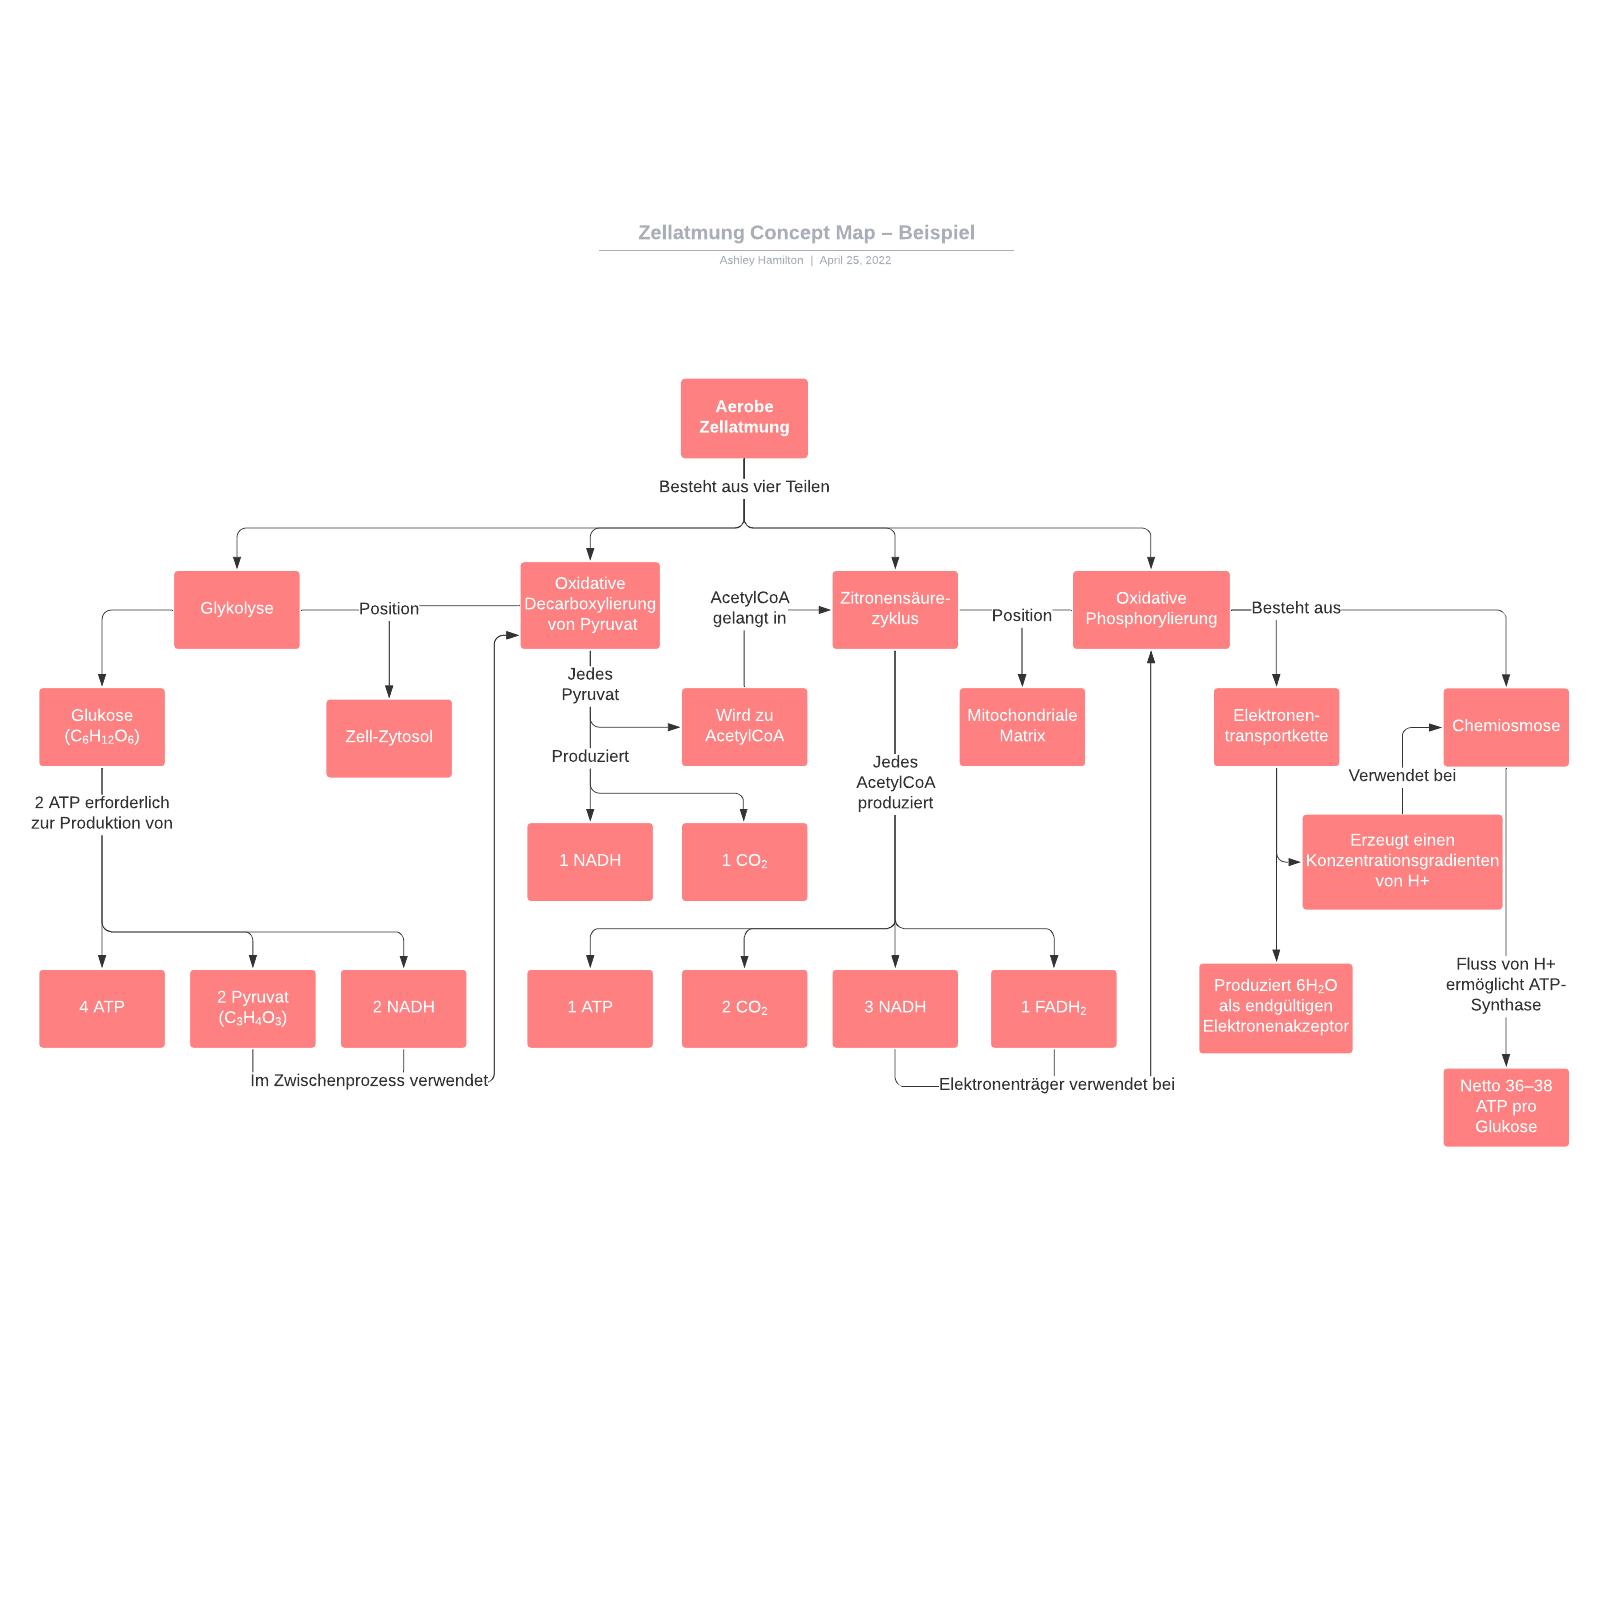 Concept Map Beispiel - Zellatmung